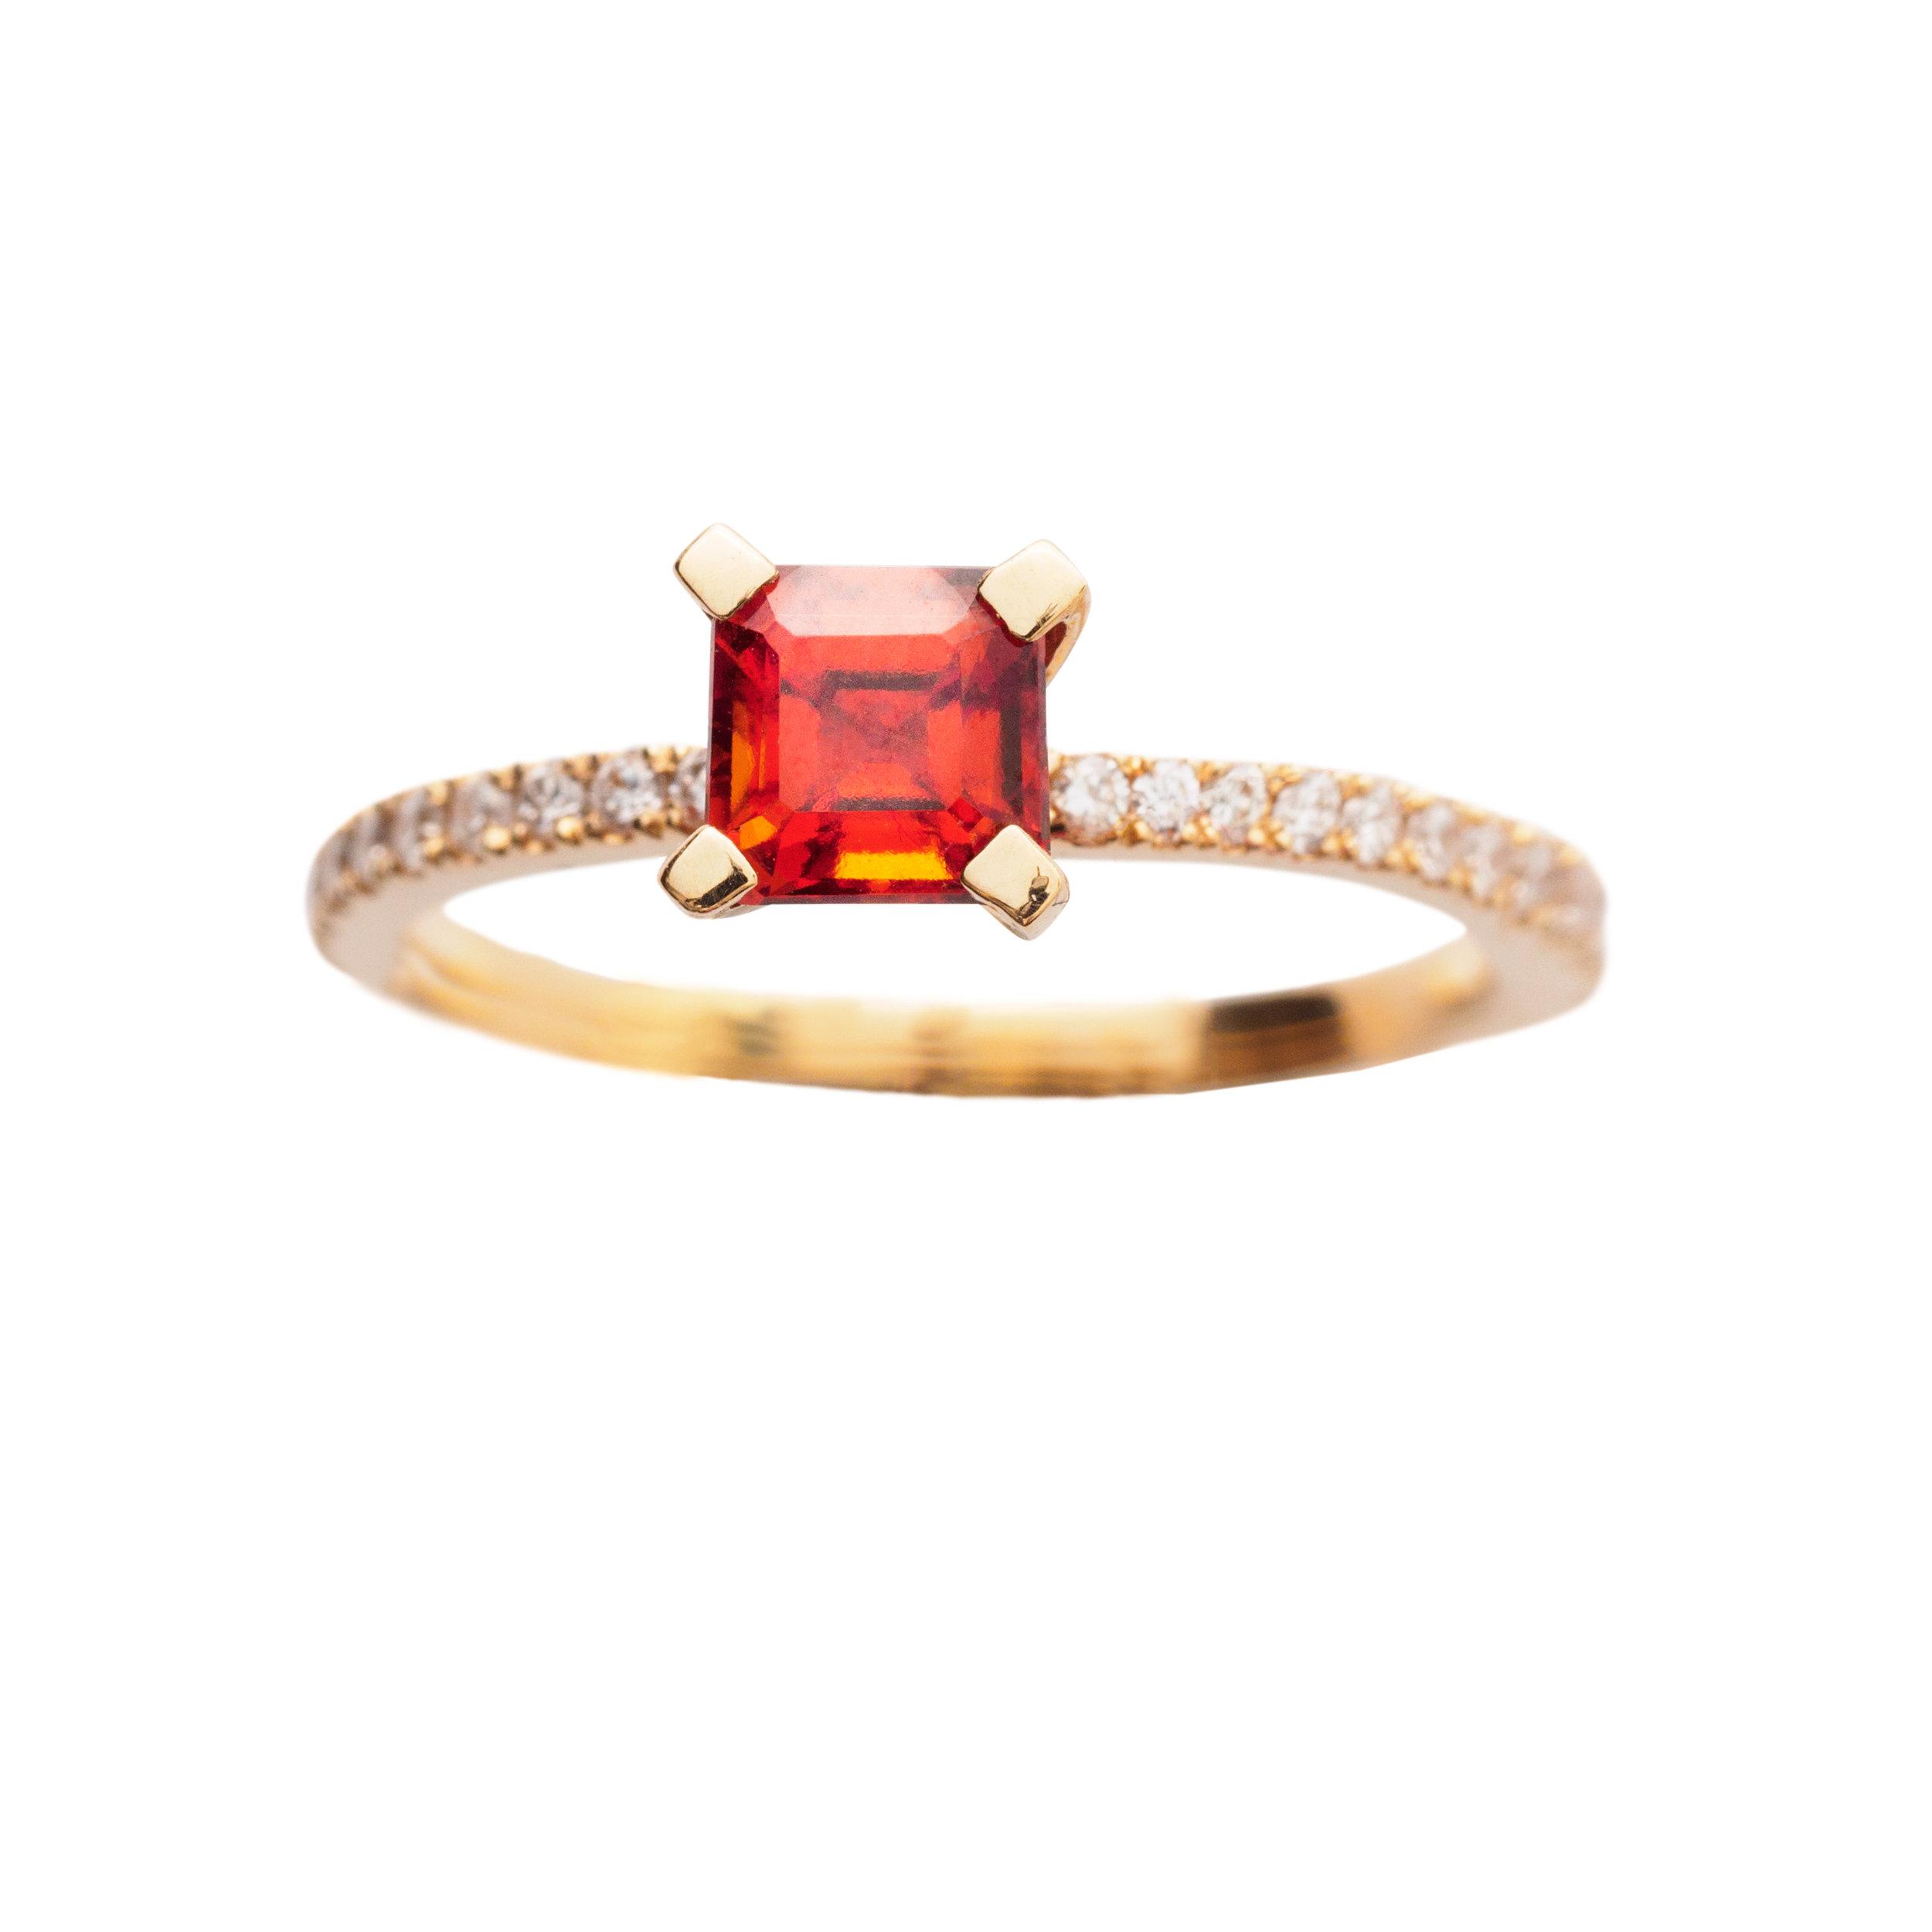 FIRENZE RING 21.200 NOK. 18 kt gold, diamonds and orange garnet